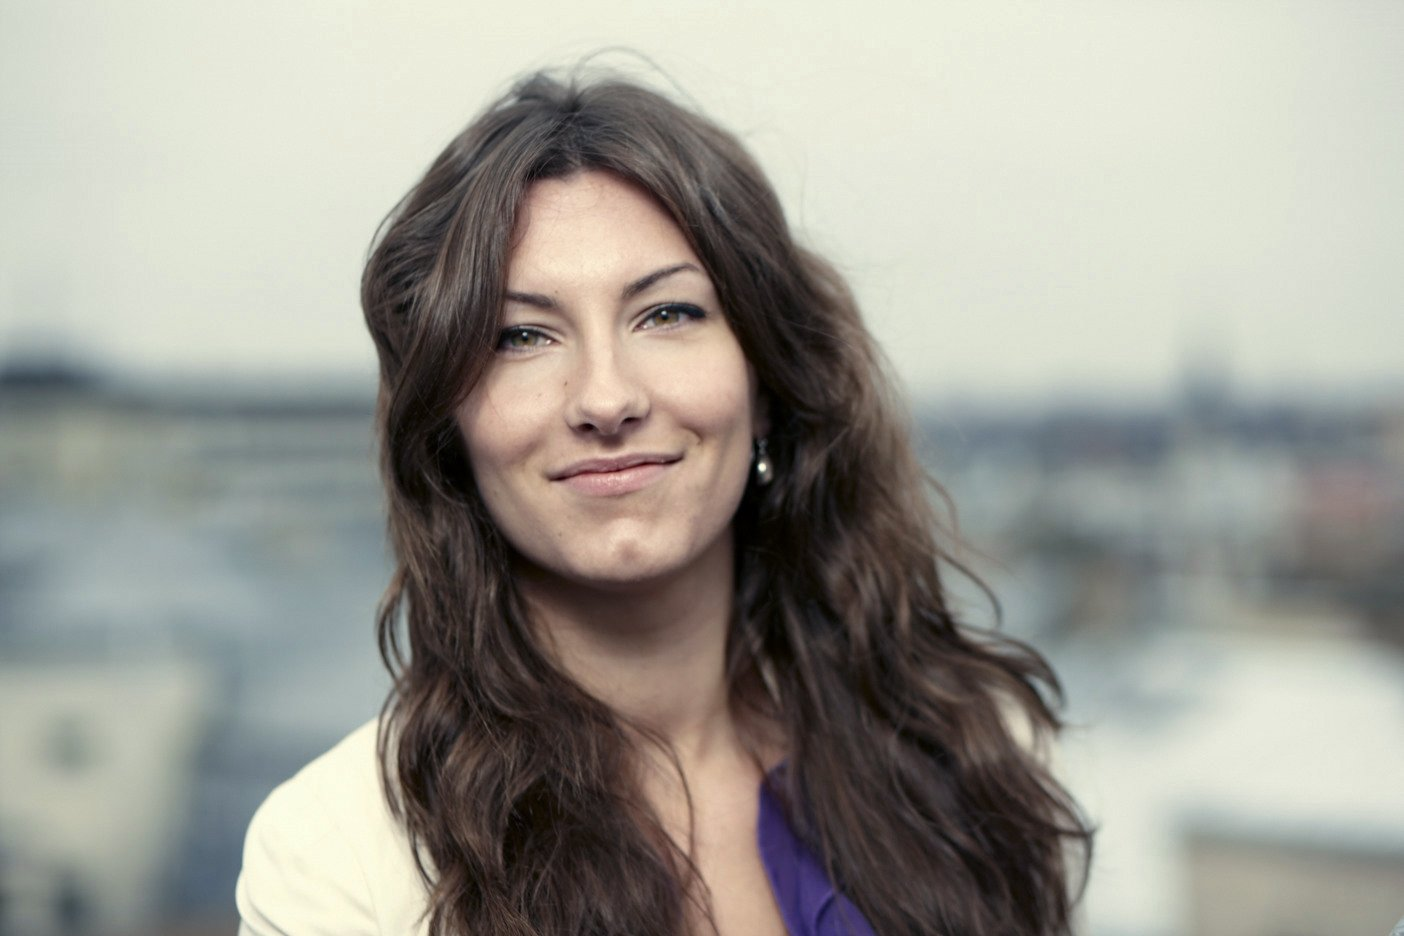 The speaker Laura Grava,'s profile image